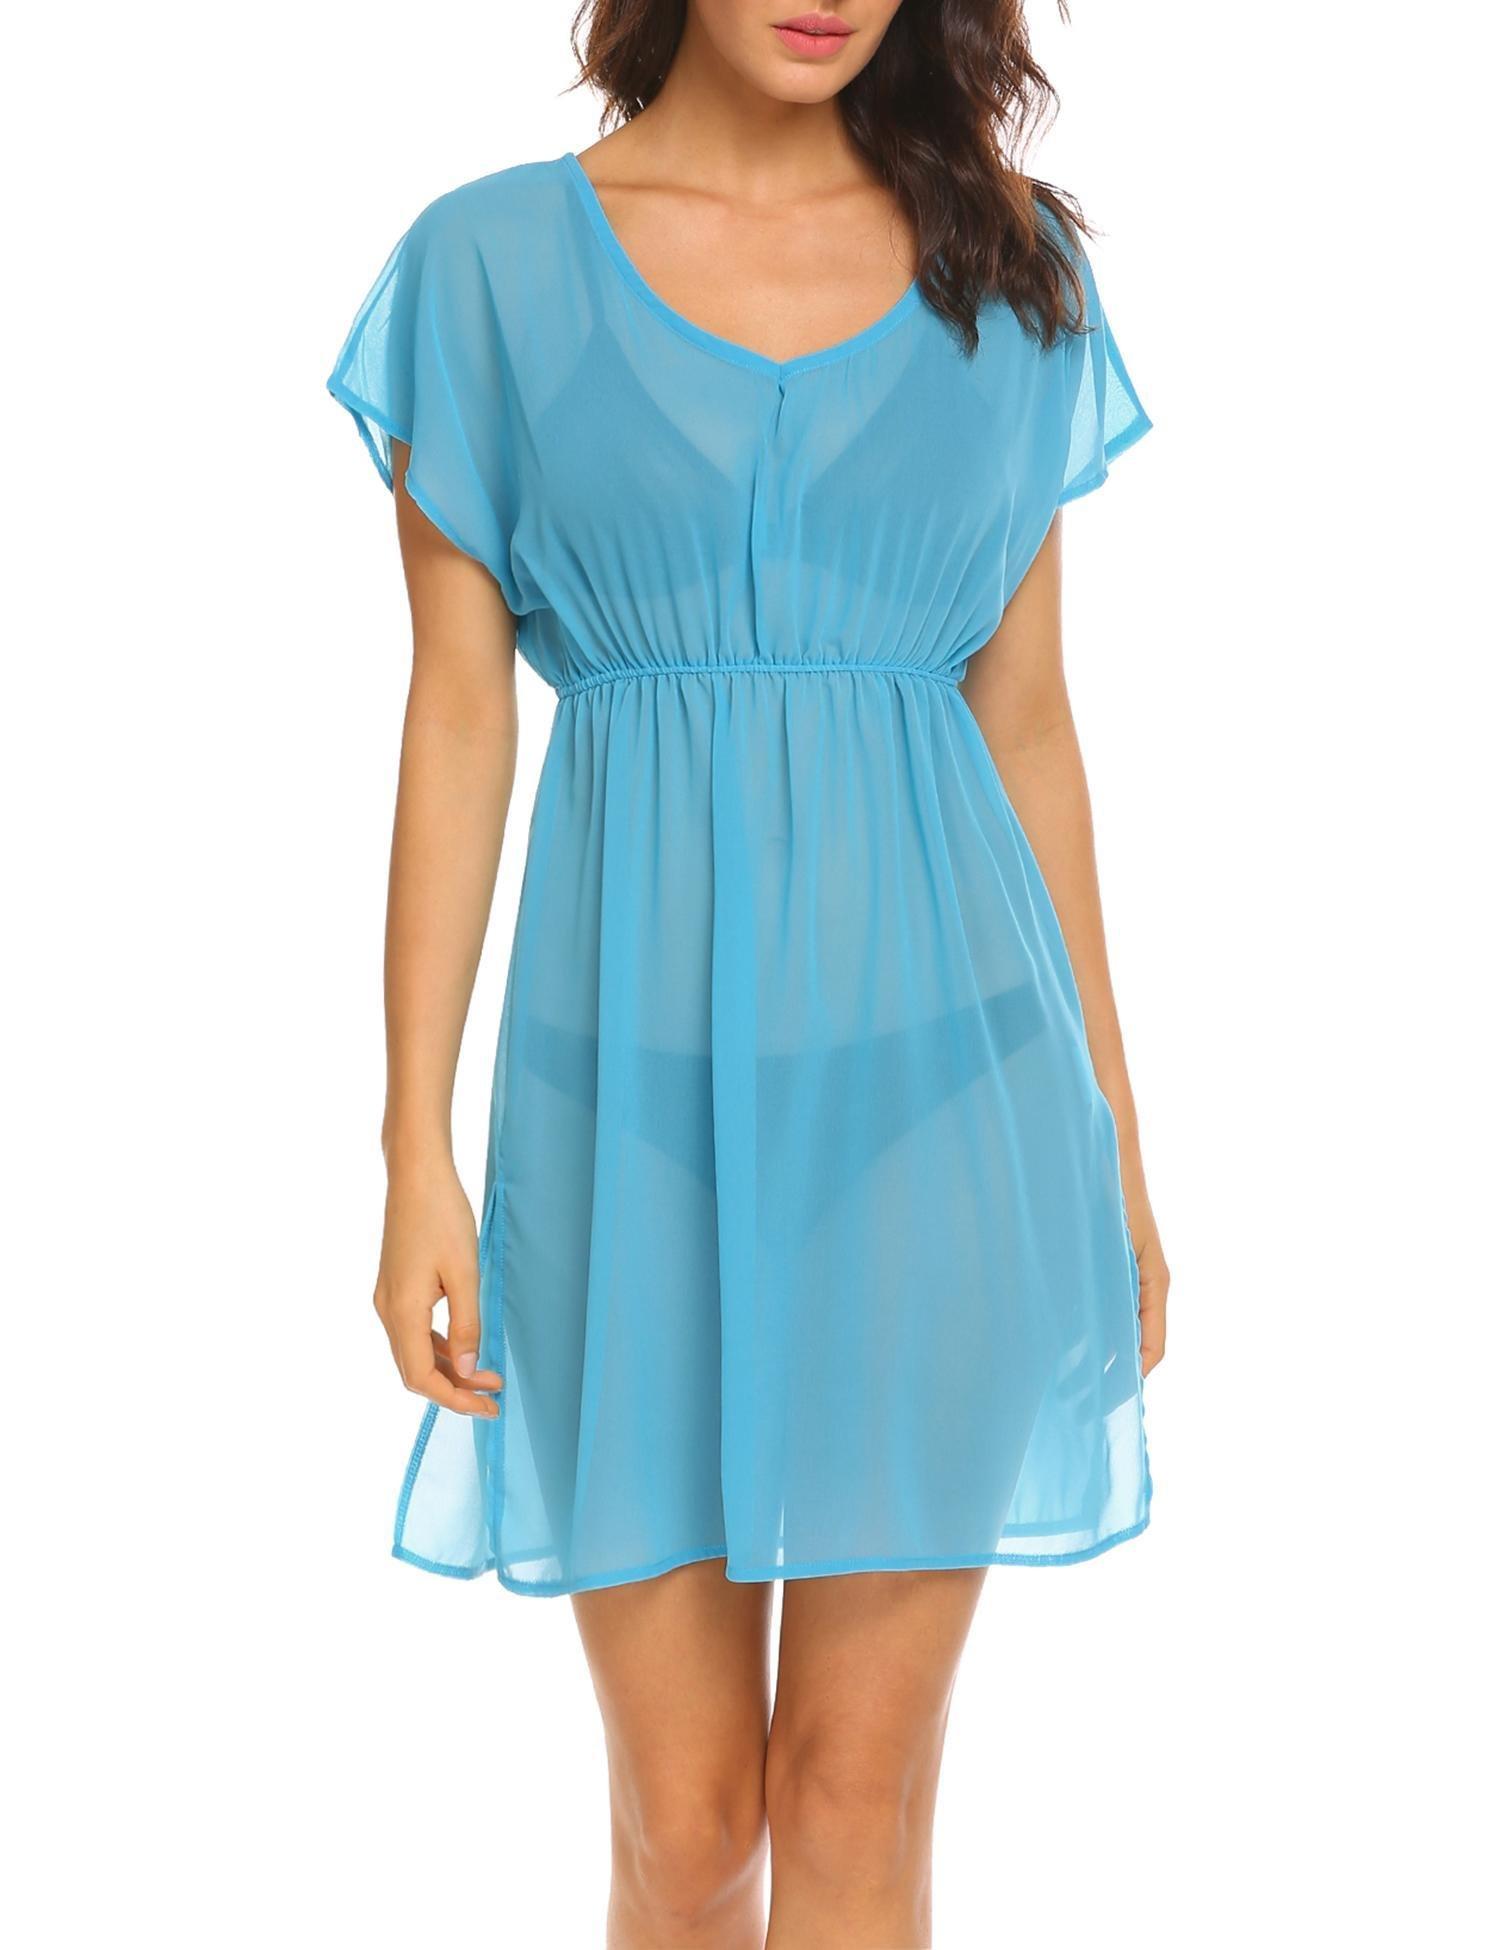 Ekouaer Womens Bathing Suit Swimwear Beach Cover Up Bikini Coverups Swimsuit Dress (Blue,S)